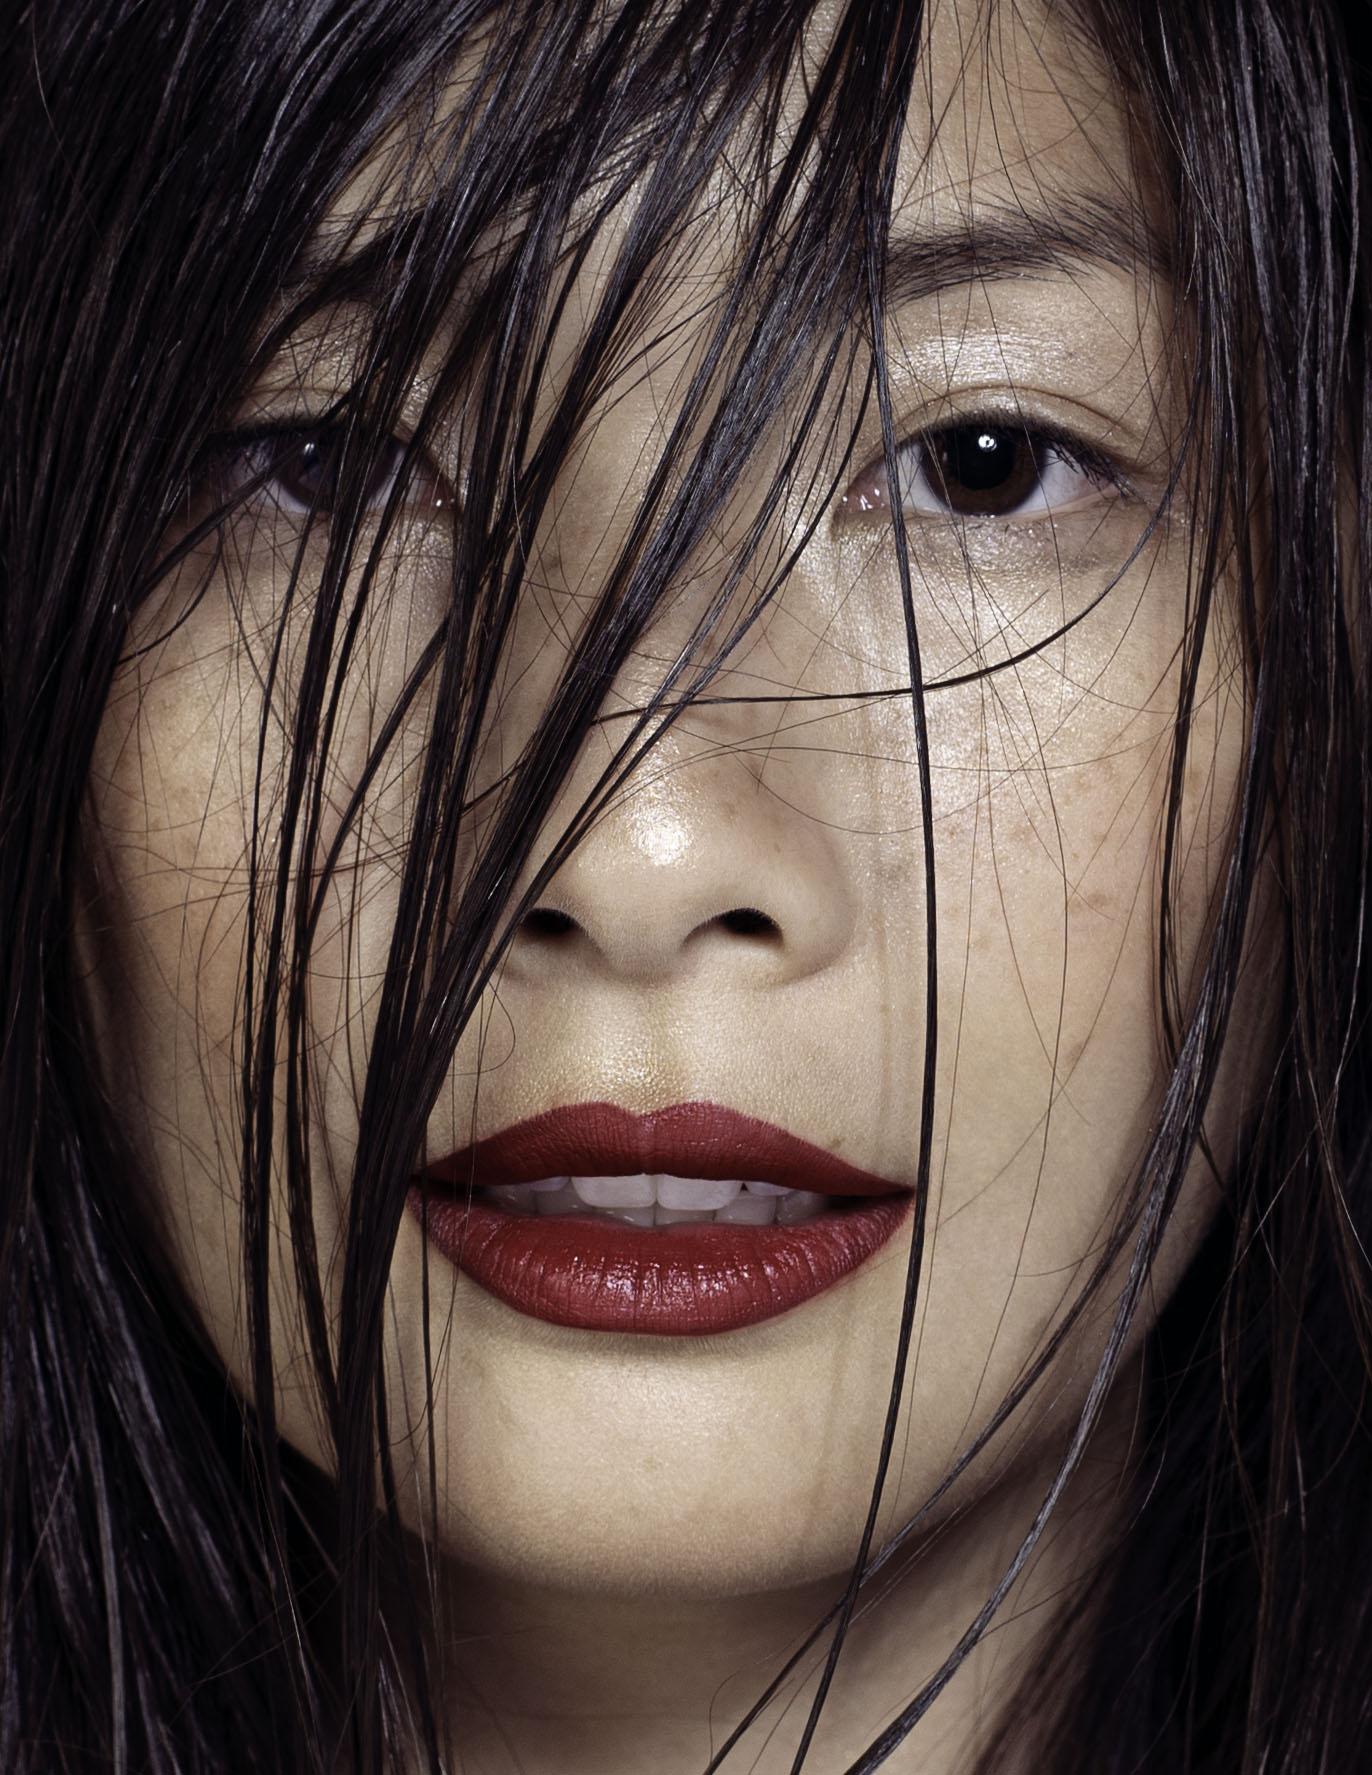 Beauty-Hue-Linh-152-Edit.jpg